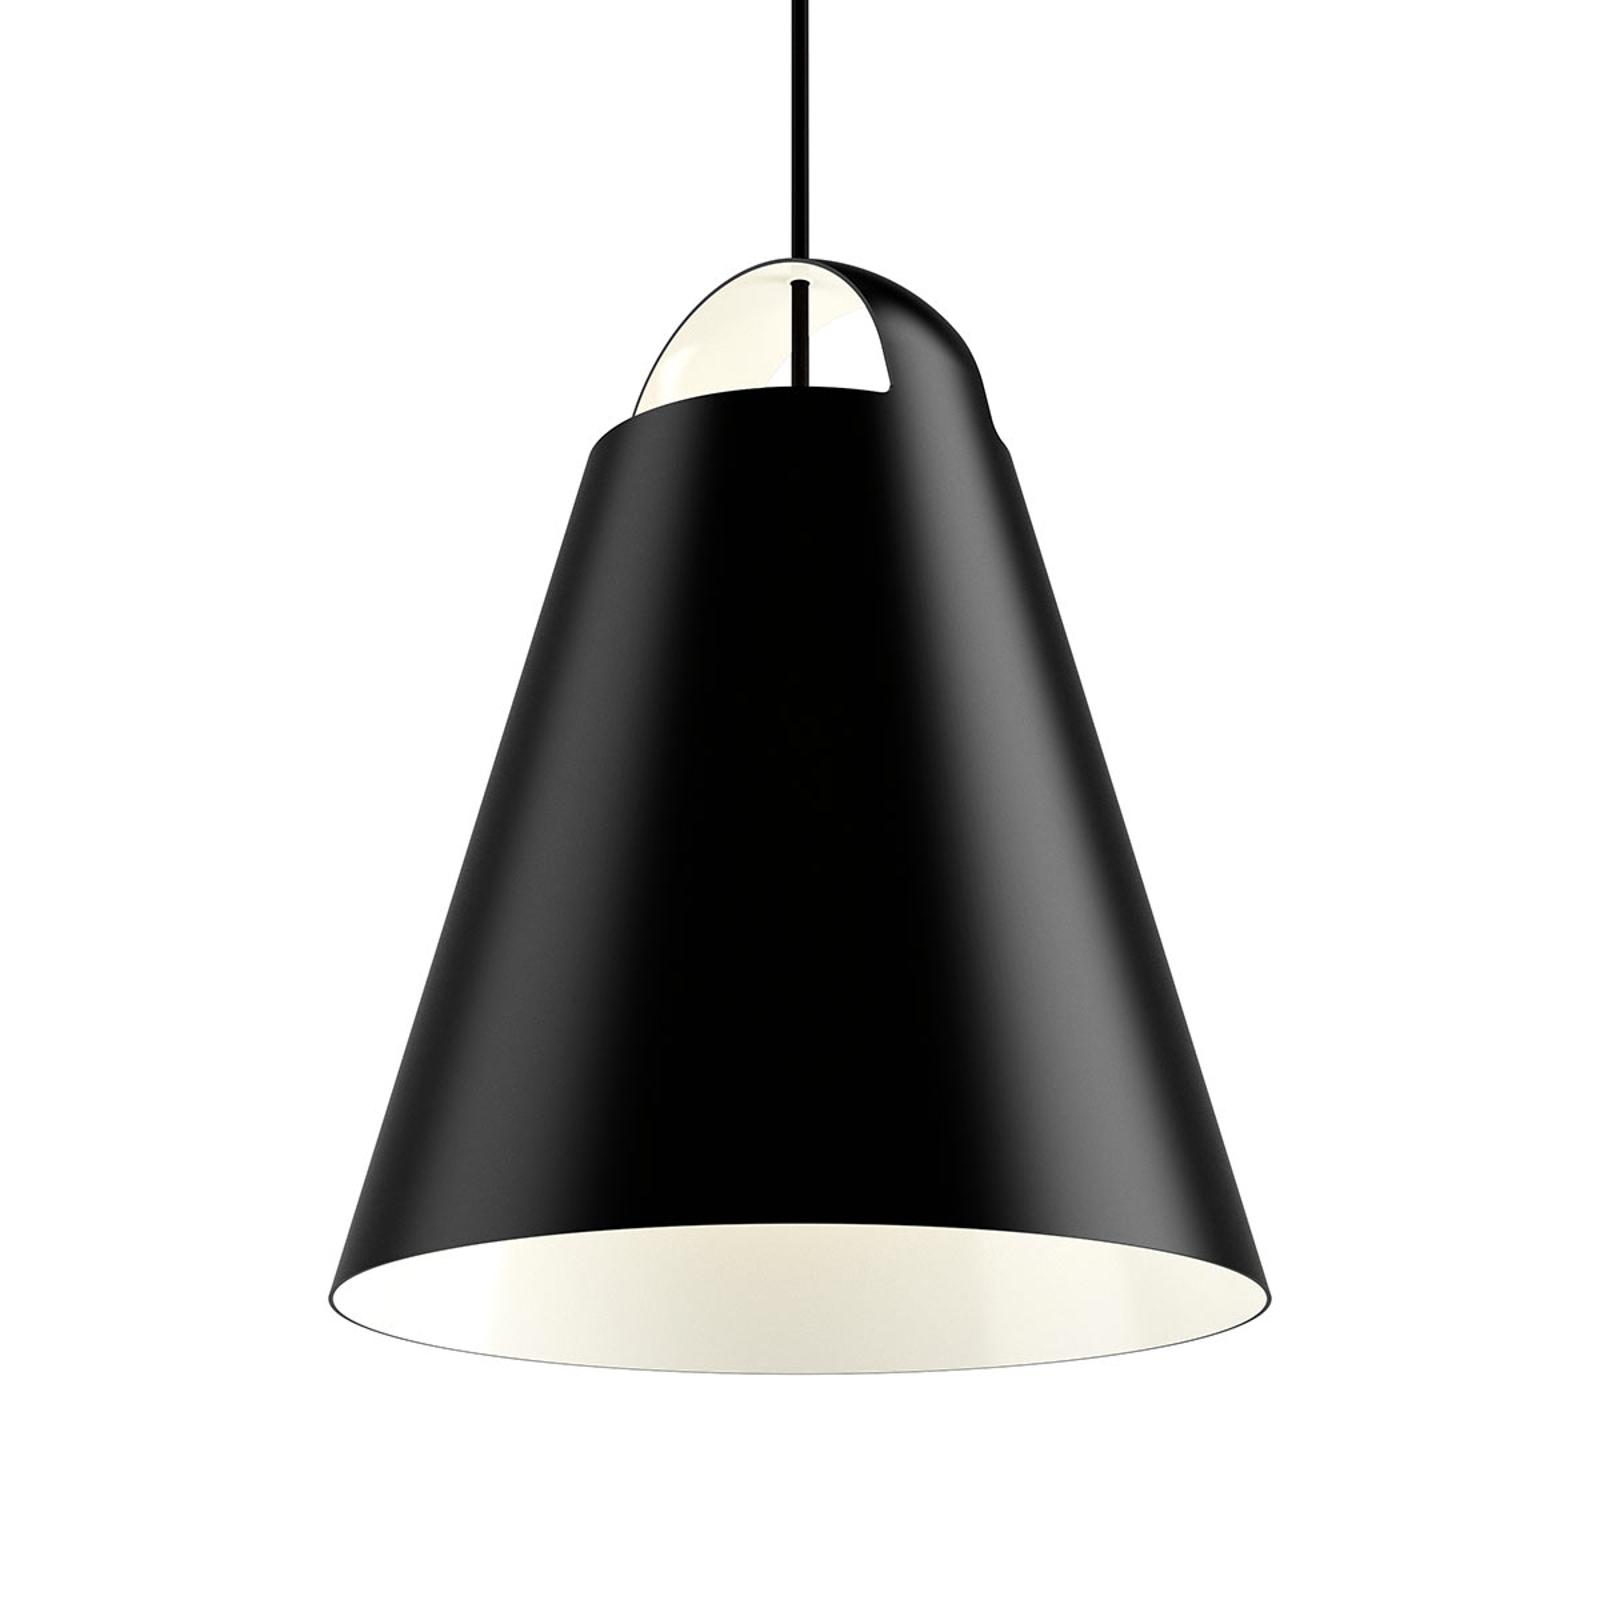 Design hanglamp Above, zwart, 40 cm